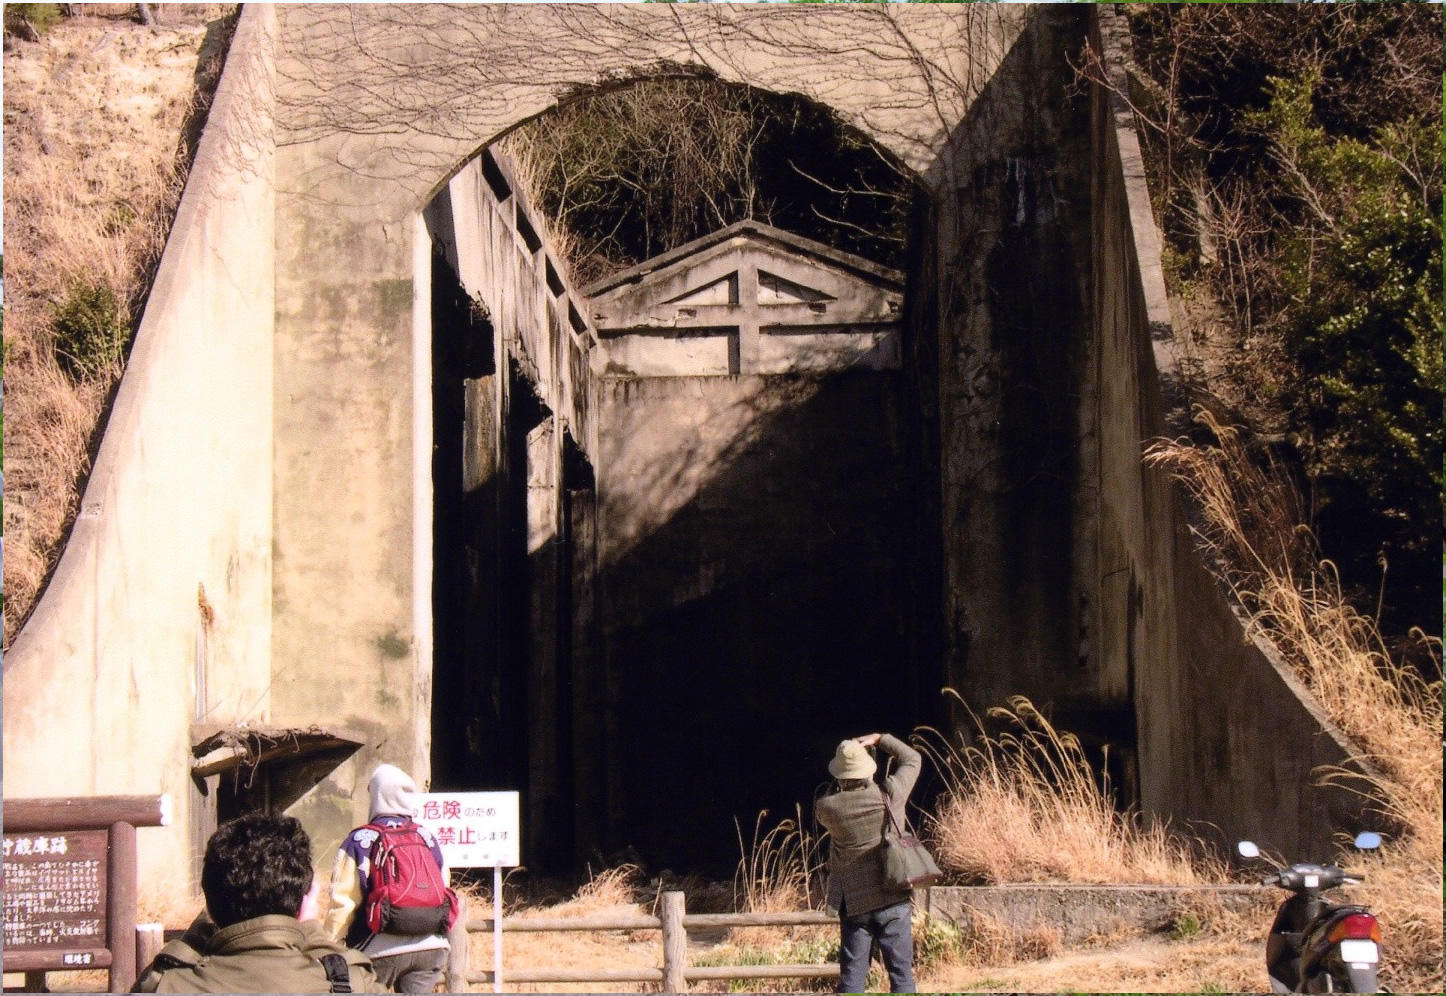 大久野島の毒ガス関連遺跡(長浦貯蔵庫跡)